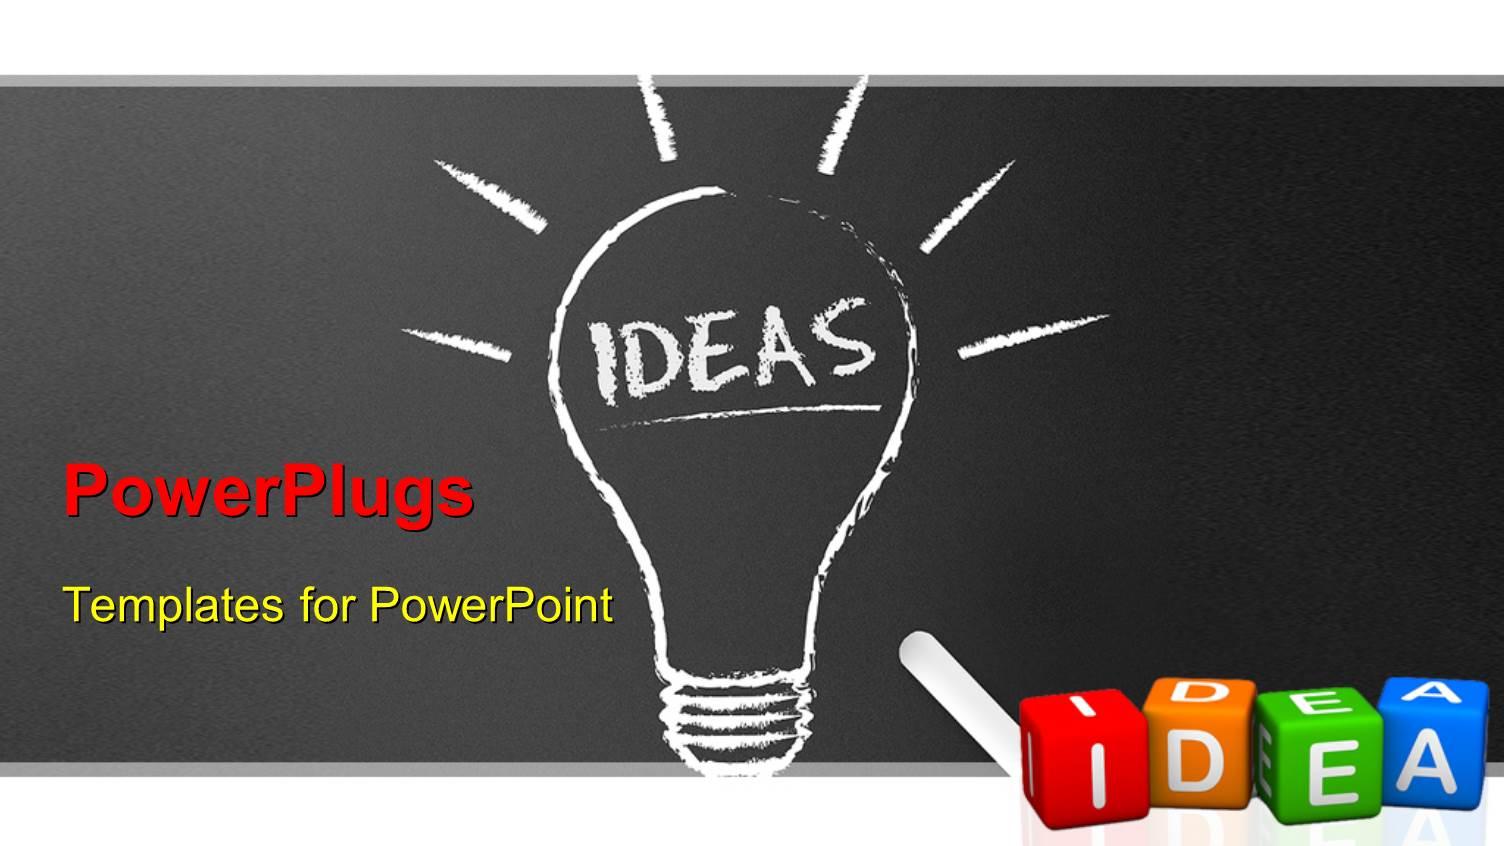 Powerpoint chalkboard template idealstalist recent posts toneelgroepblik Gallery